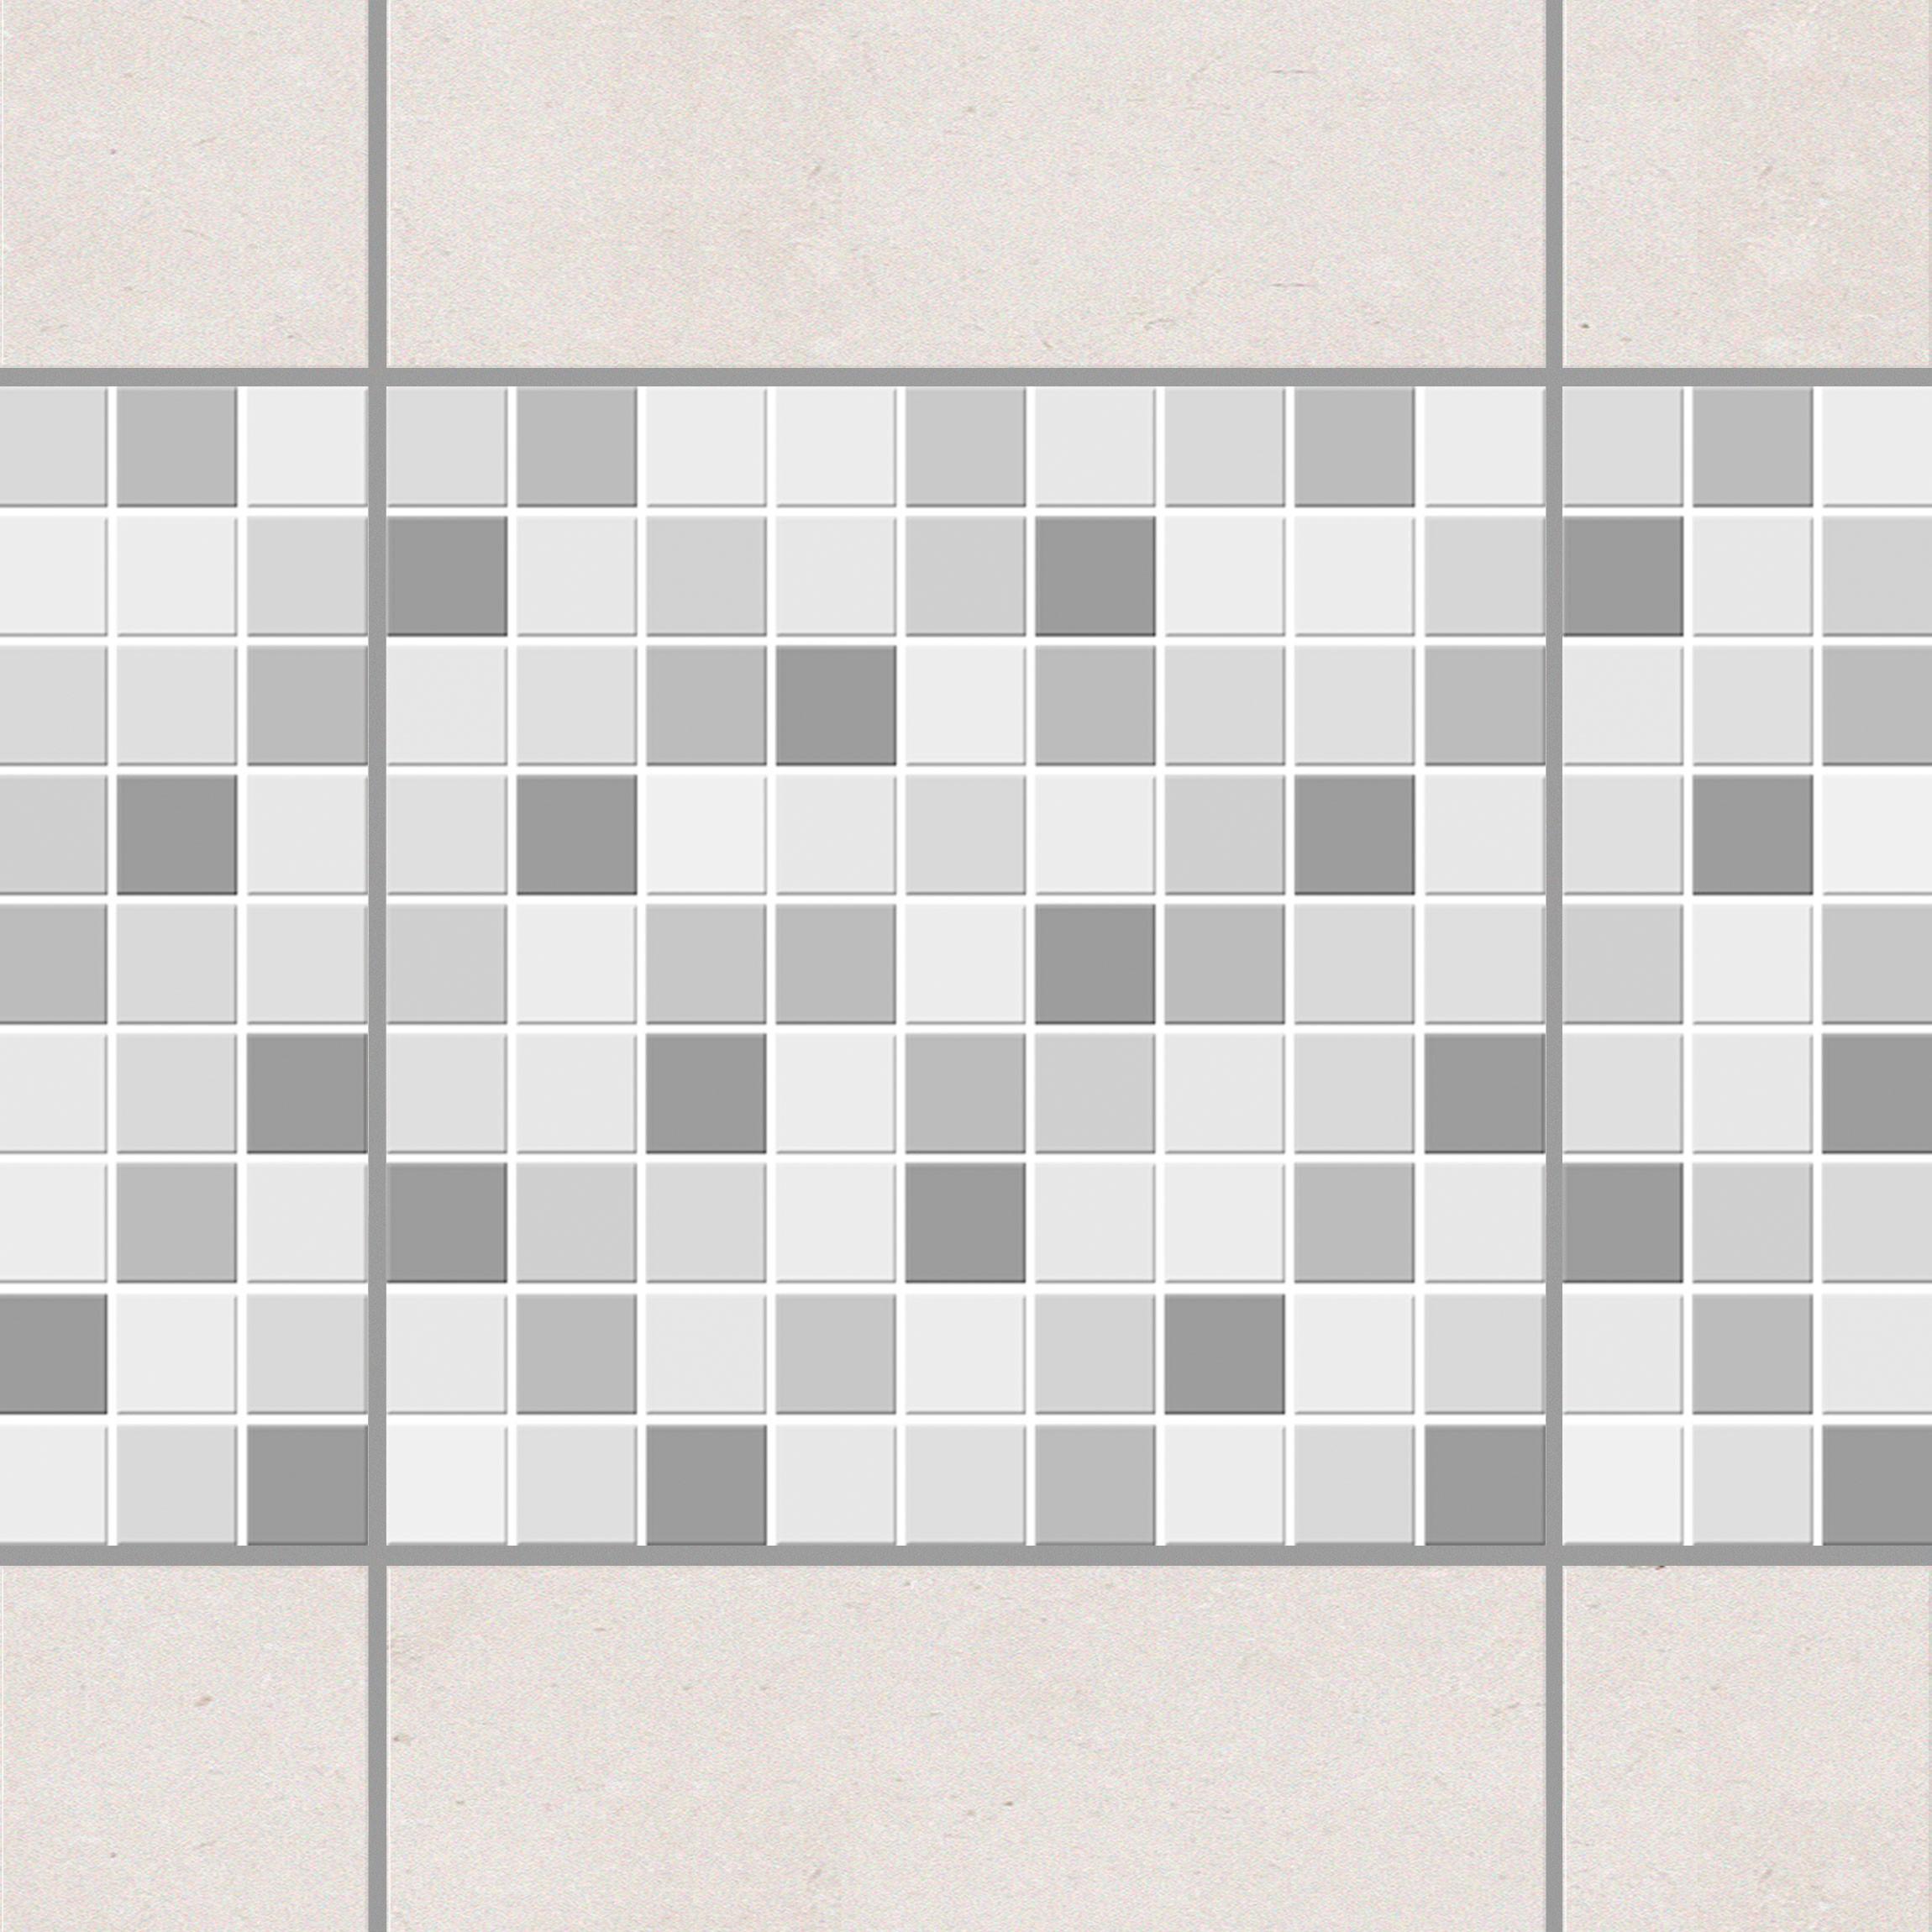 Full Size of Fliesen Bordre Selbstklebende Mosaikfliesen Winterset 20x20 Cm Bodenfliesen Küche Holzoptik Bad Bodengleiche Dusche Fliesenspiegel Holzfliesen Für Badezimmer Wohnzimmer Selbstklebende Fliesen